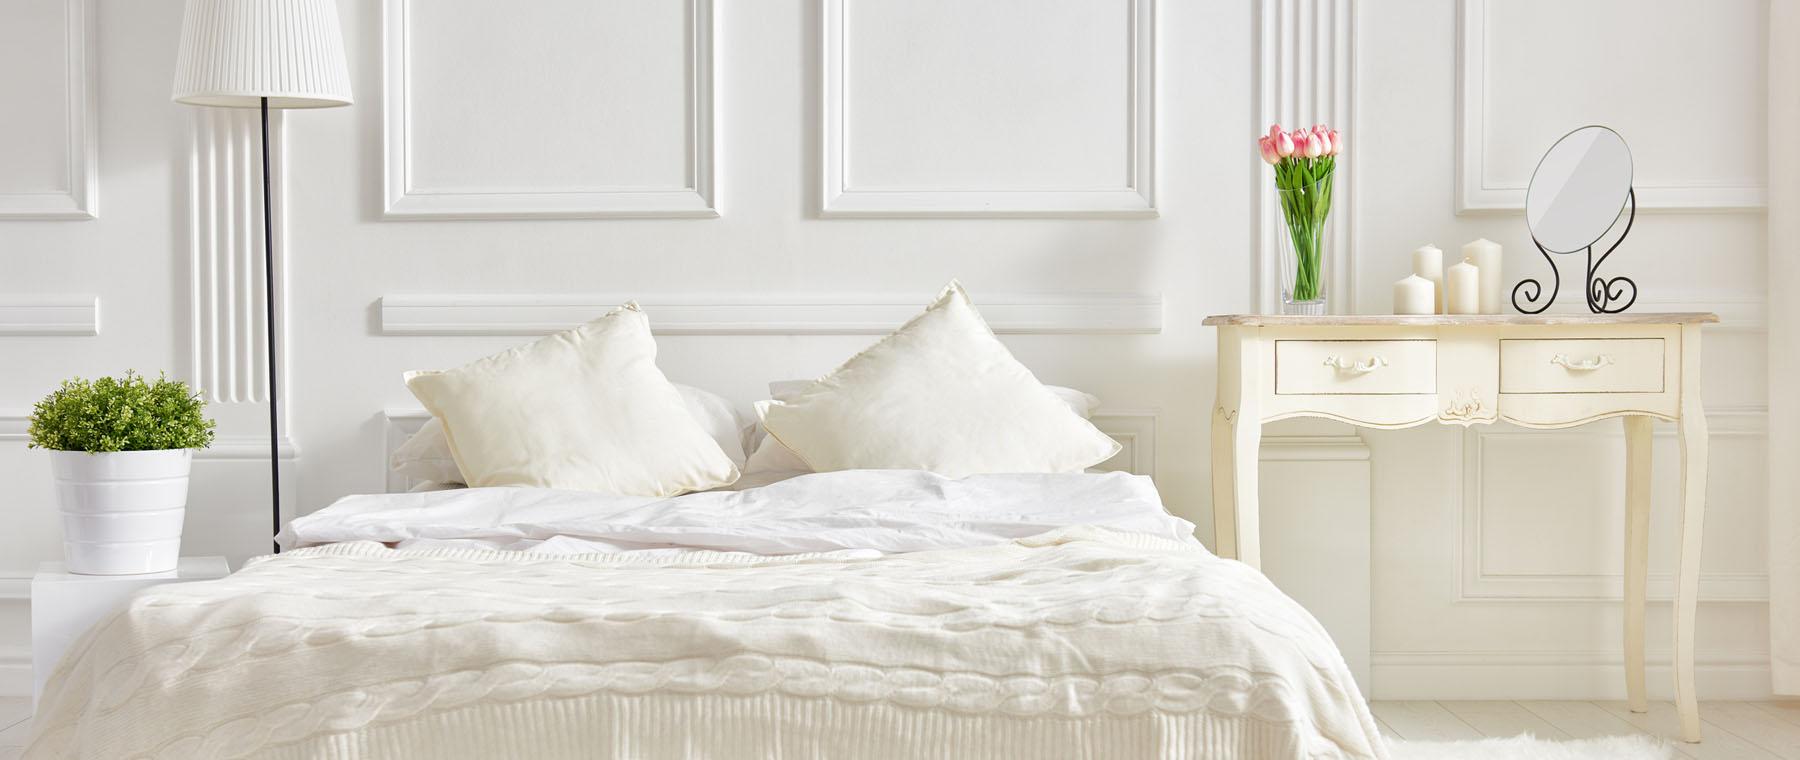 elegant classic bedroom